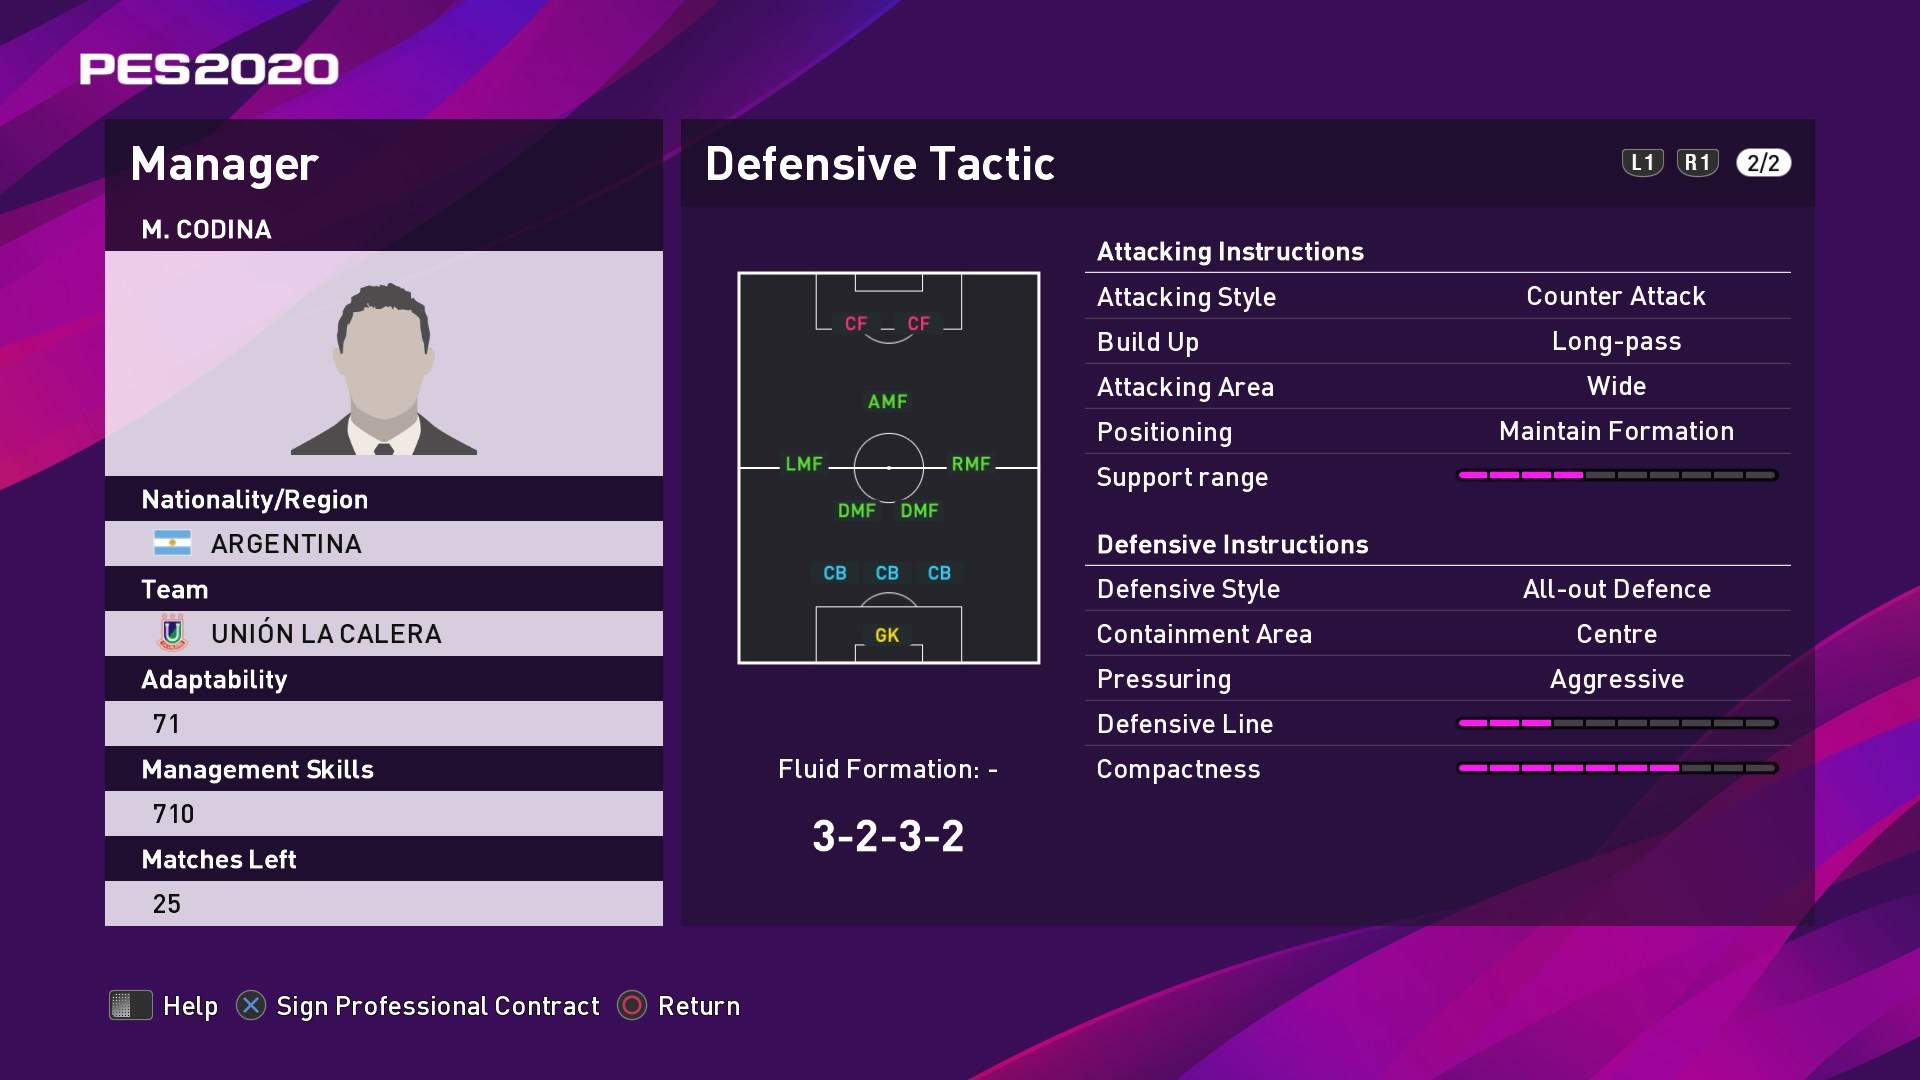 M. Codina (Juan Pablo Vojvoda) Defensive Tactic in PES 2020 myClub